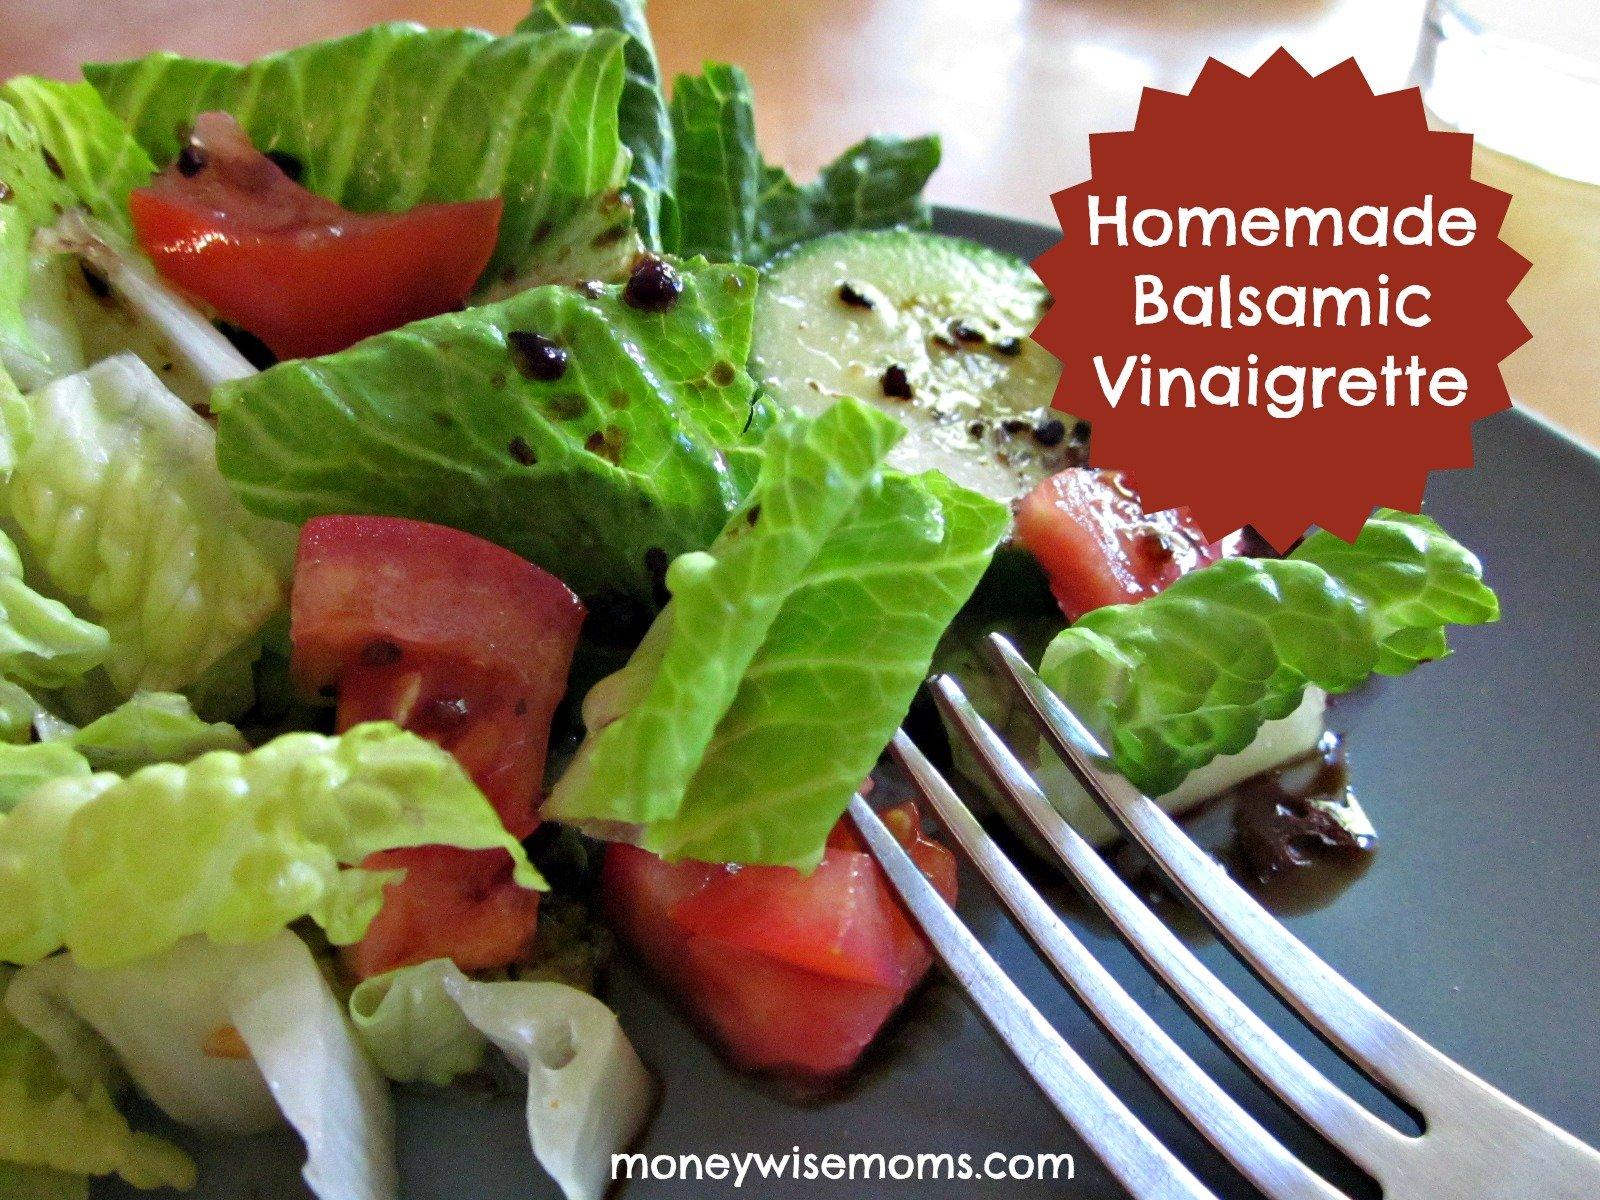 Homemade Balsamic Vinaigrette #realfood #recipe | MoneywiseMoms